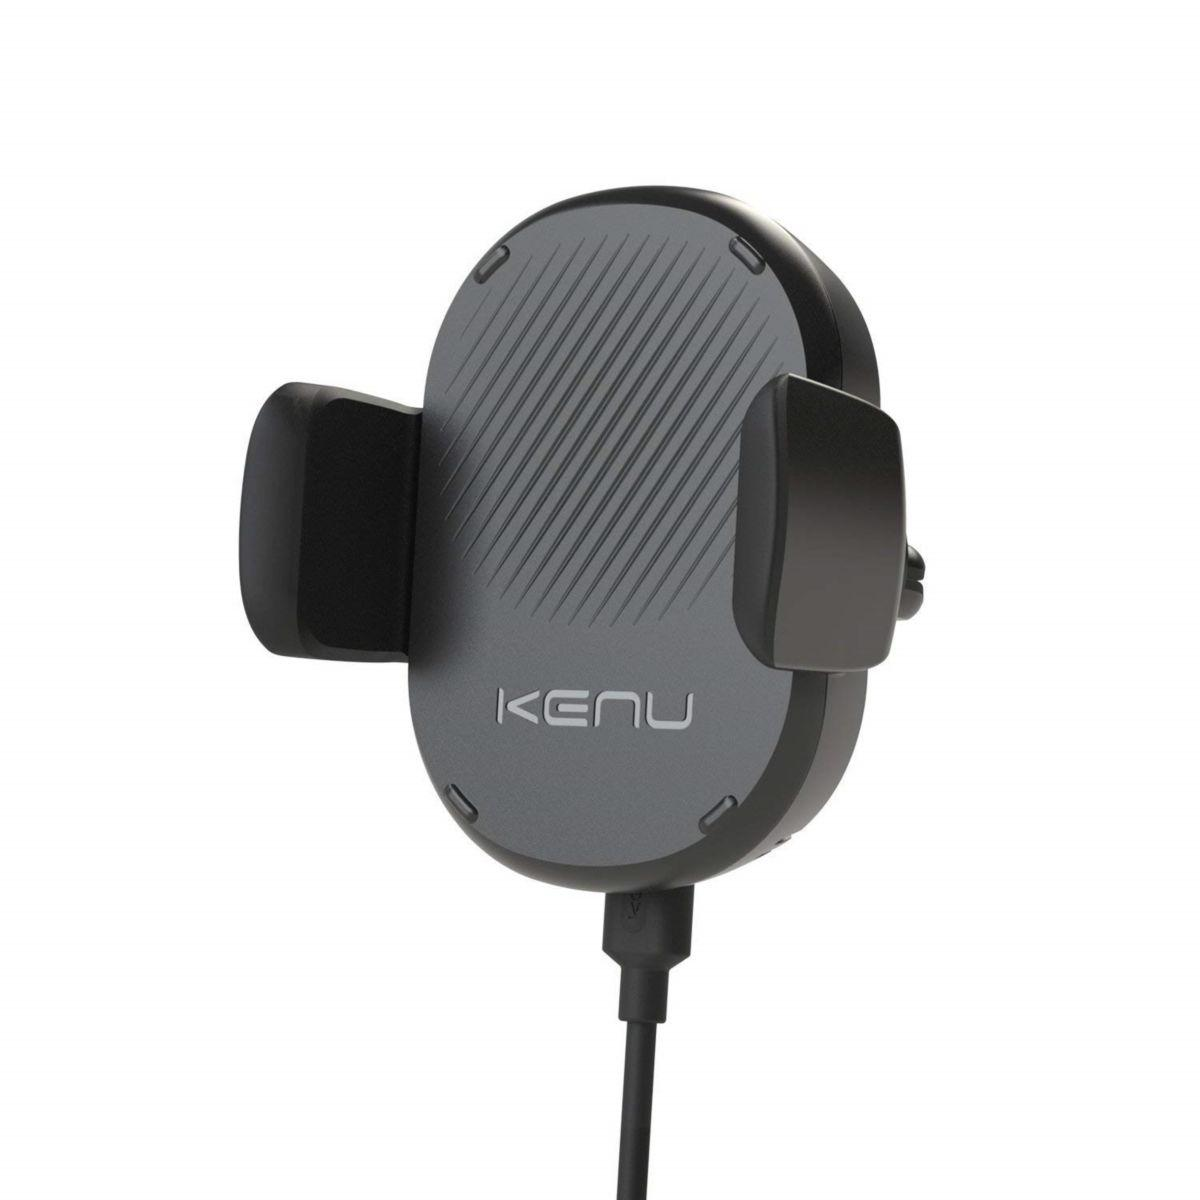 Chargeur kenu chargeur � induction airframe wireless - livraison offerte : code premium (photo)